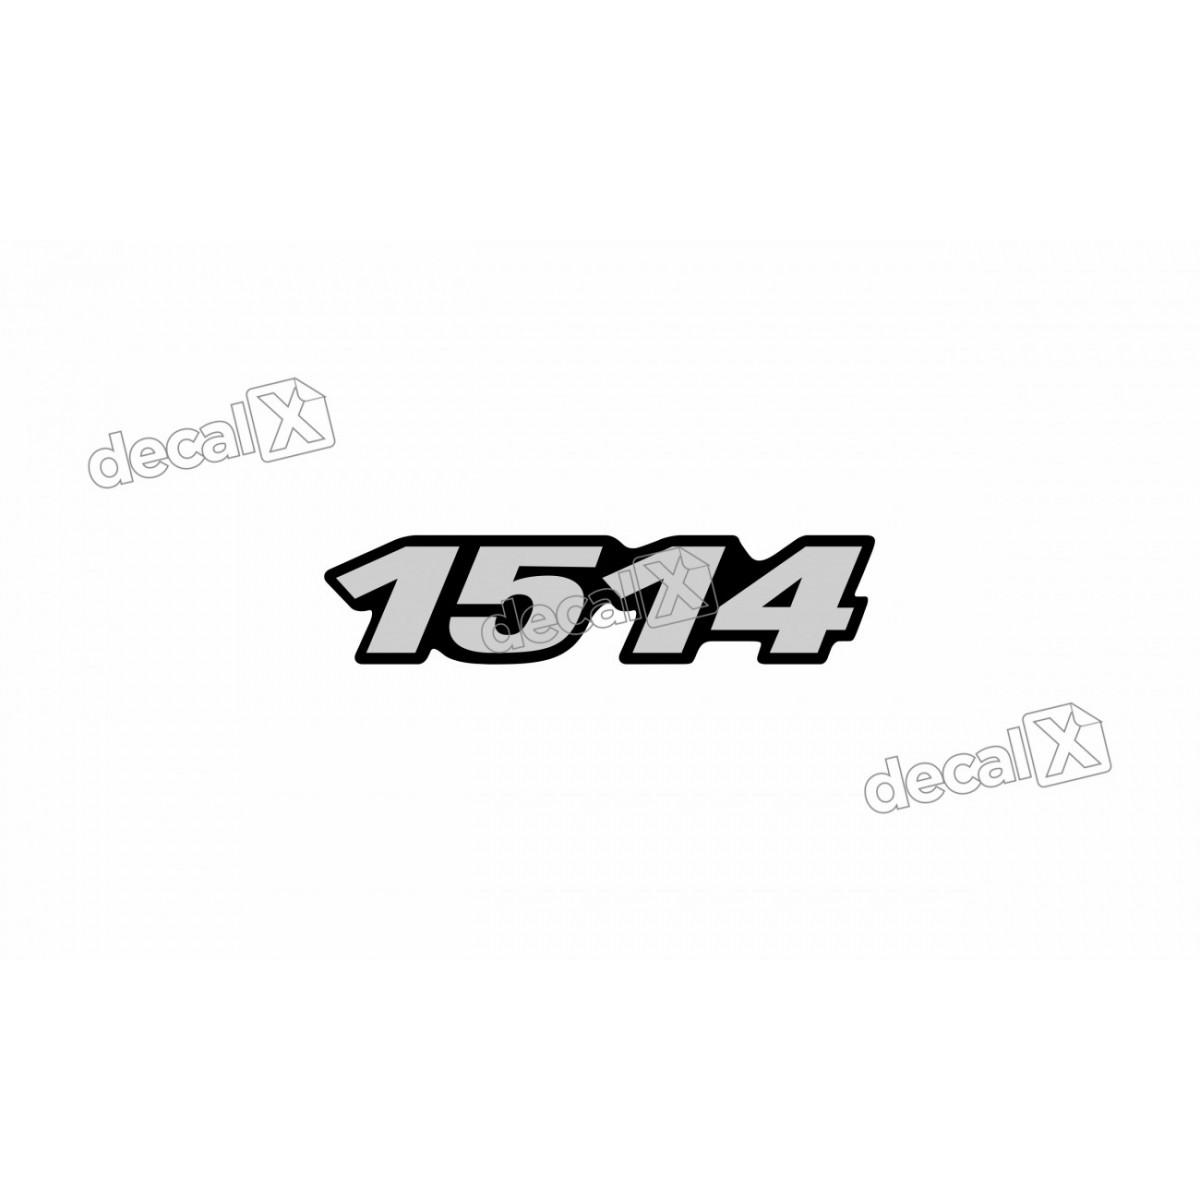 Adesivo Emblema Resinado Mercedes 1514 Cm33 Decalx